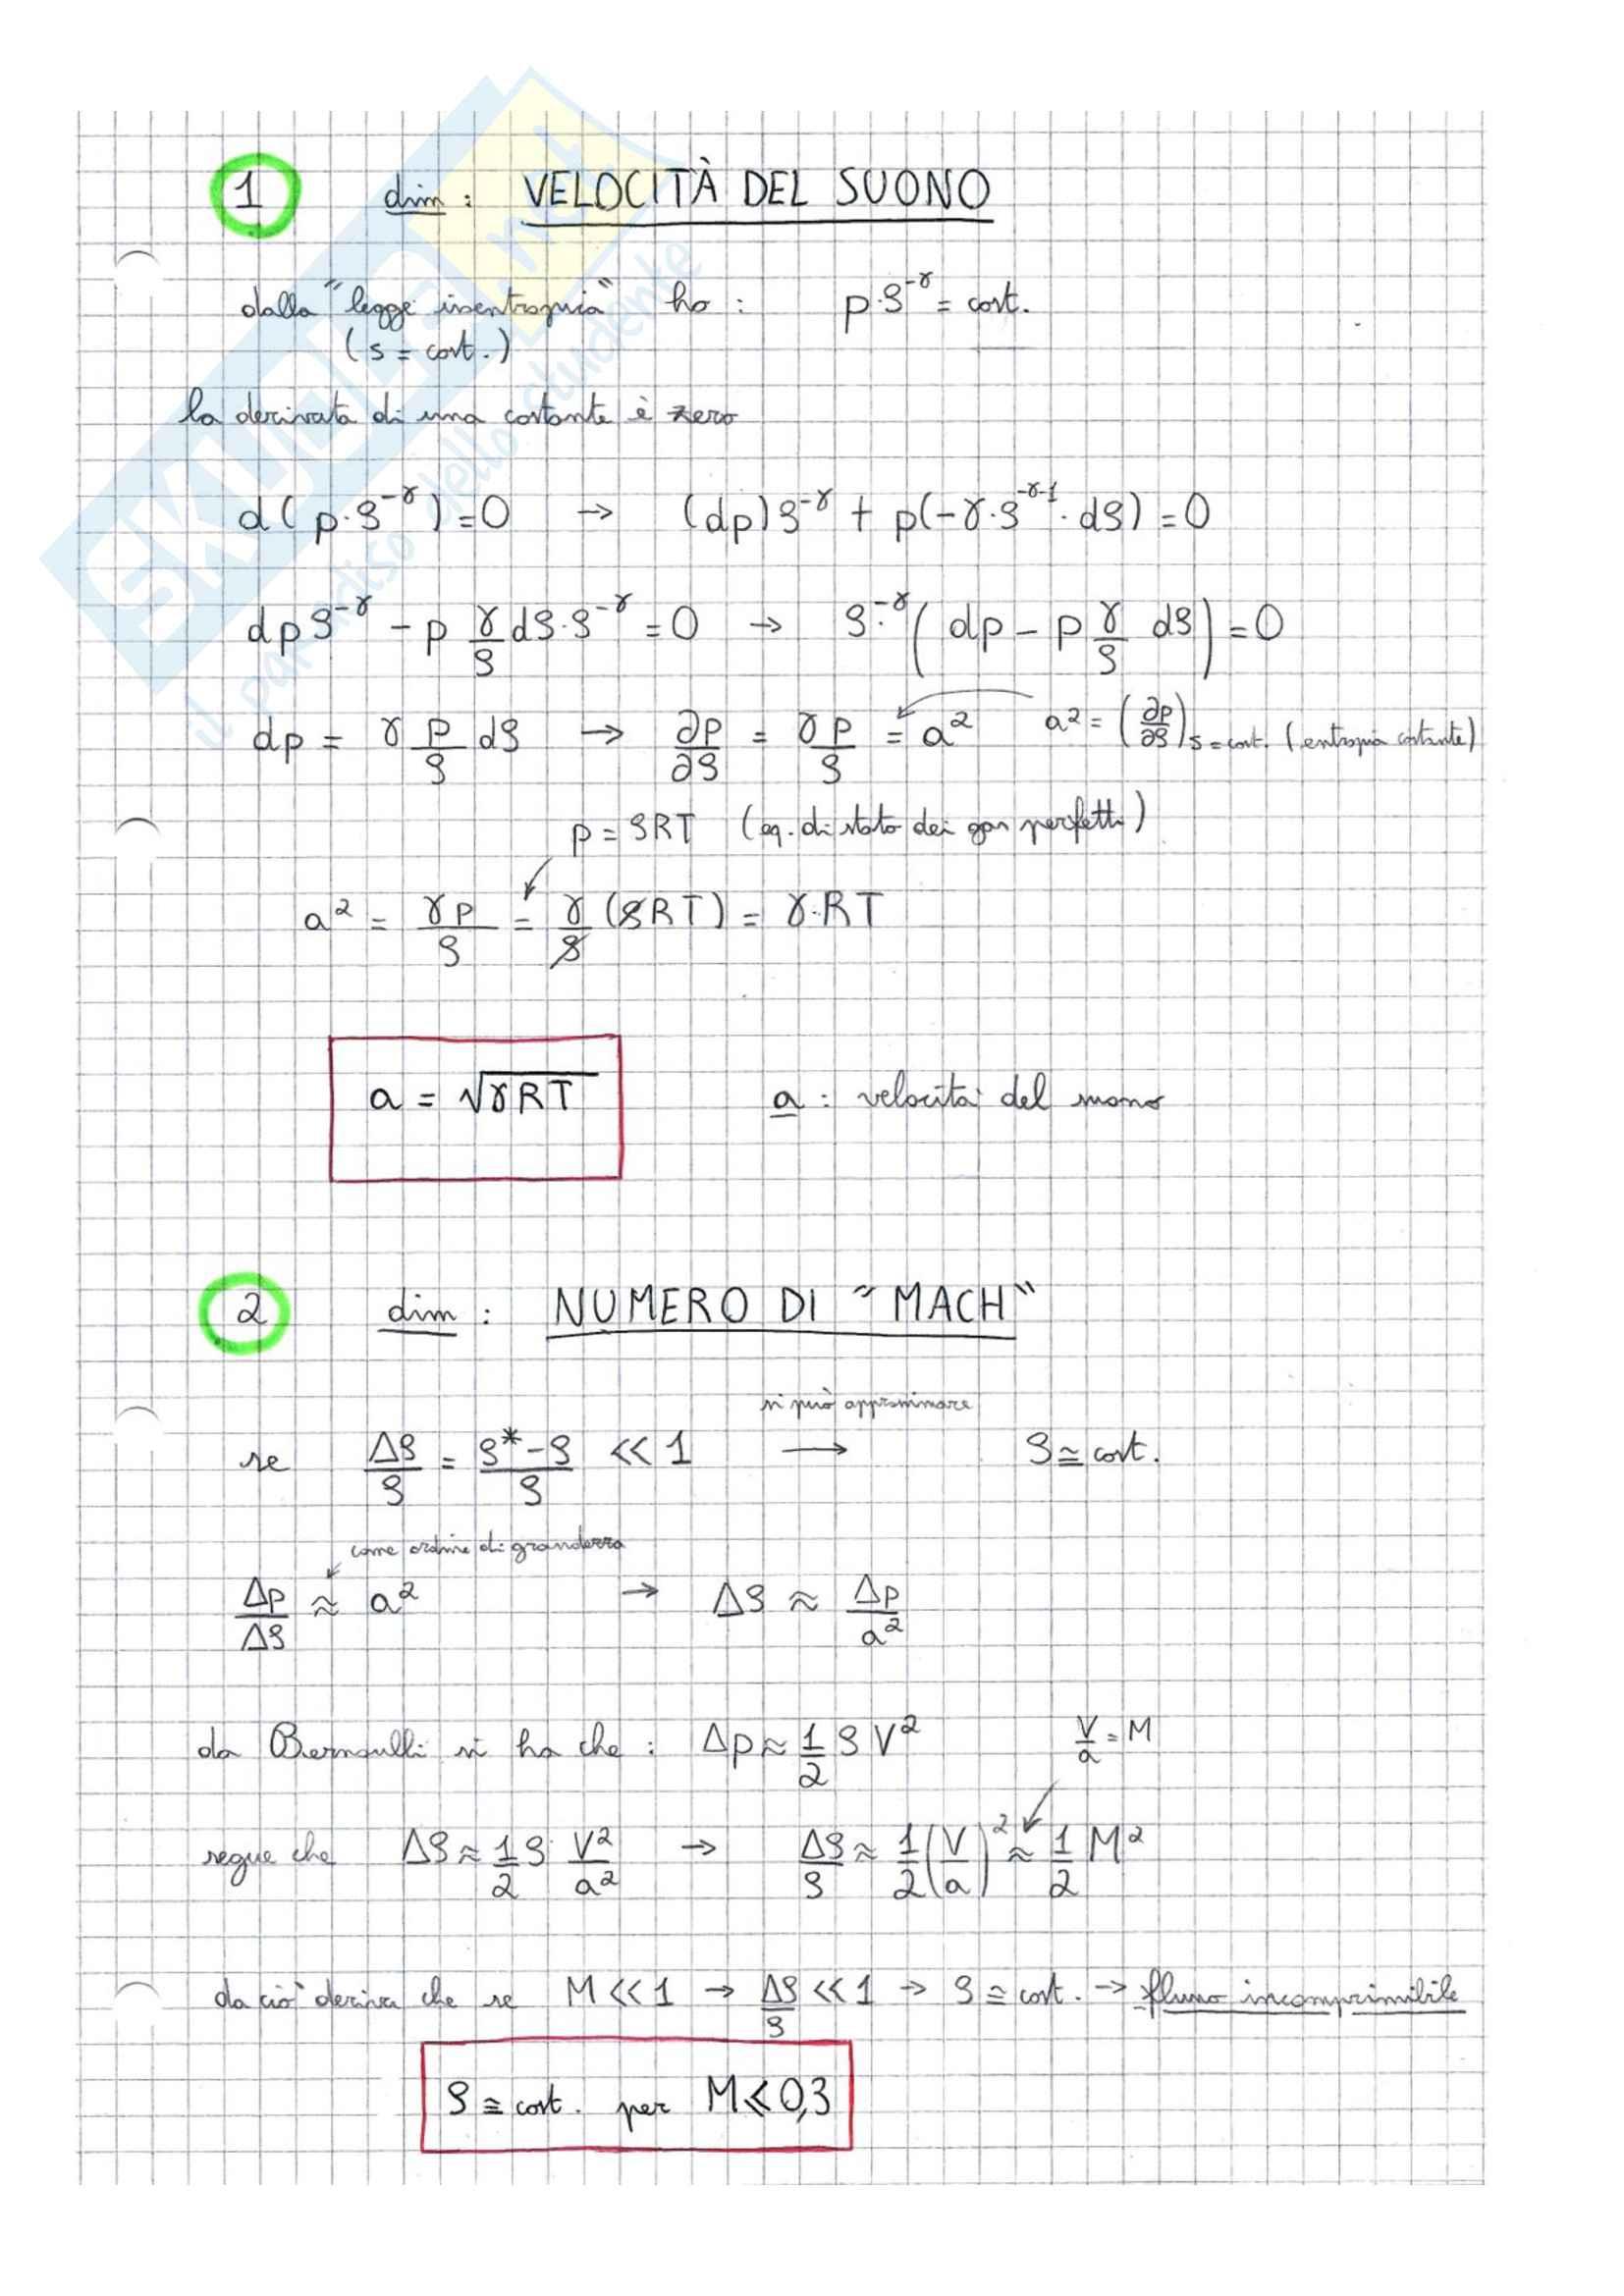 Fluidodinamica - Appunti (parte 1) Pag. 1